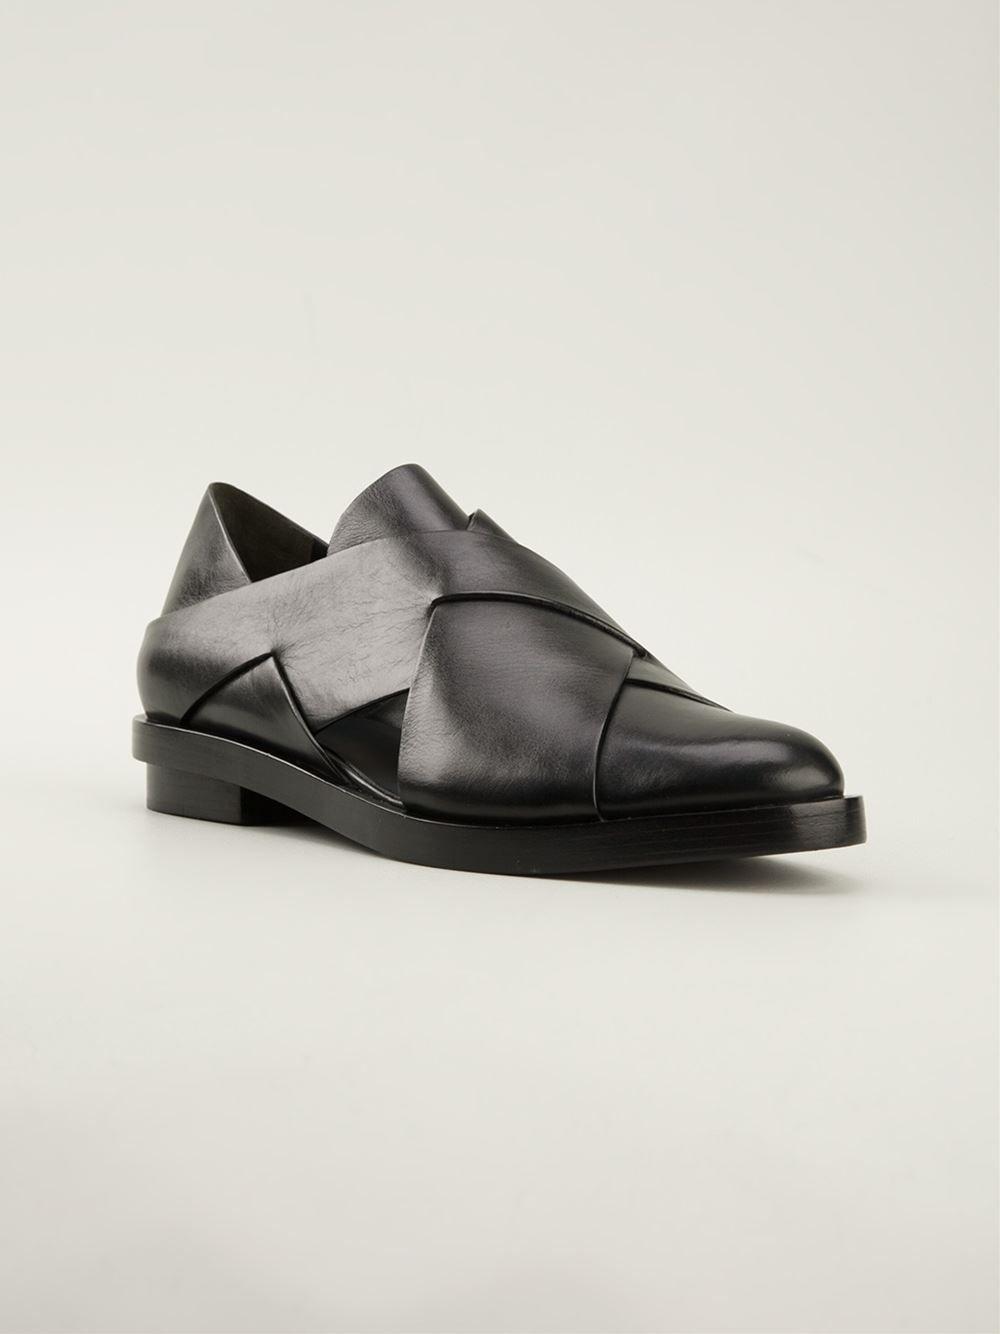 1dea03047 Alexander Wang `morgan` Loafers - Feathers - Farfetch.com